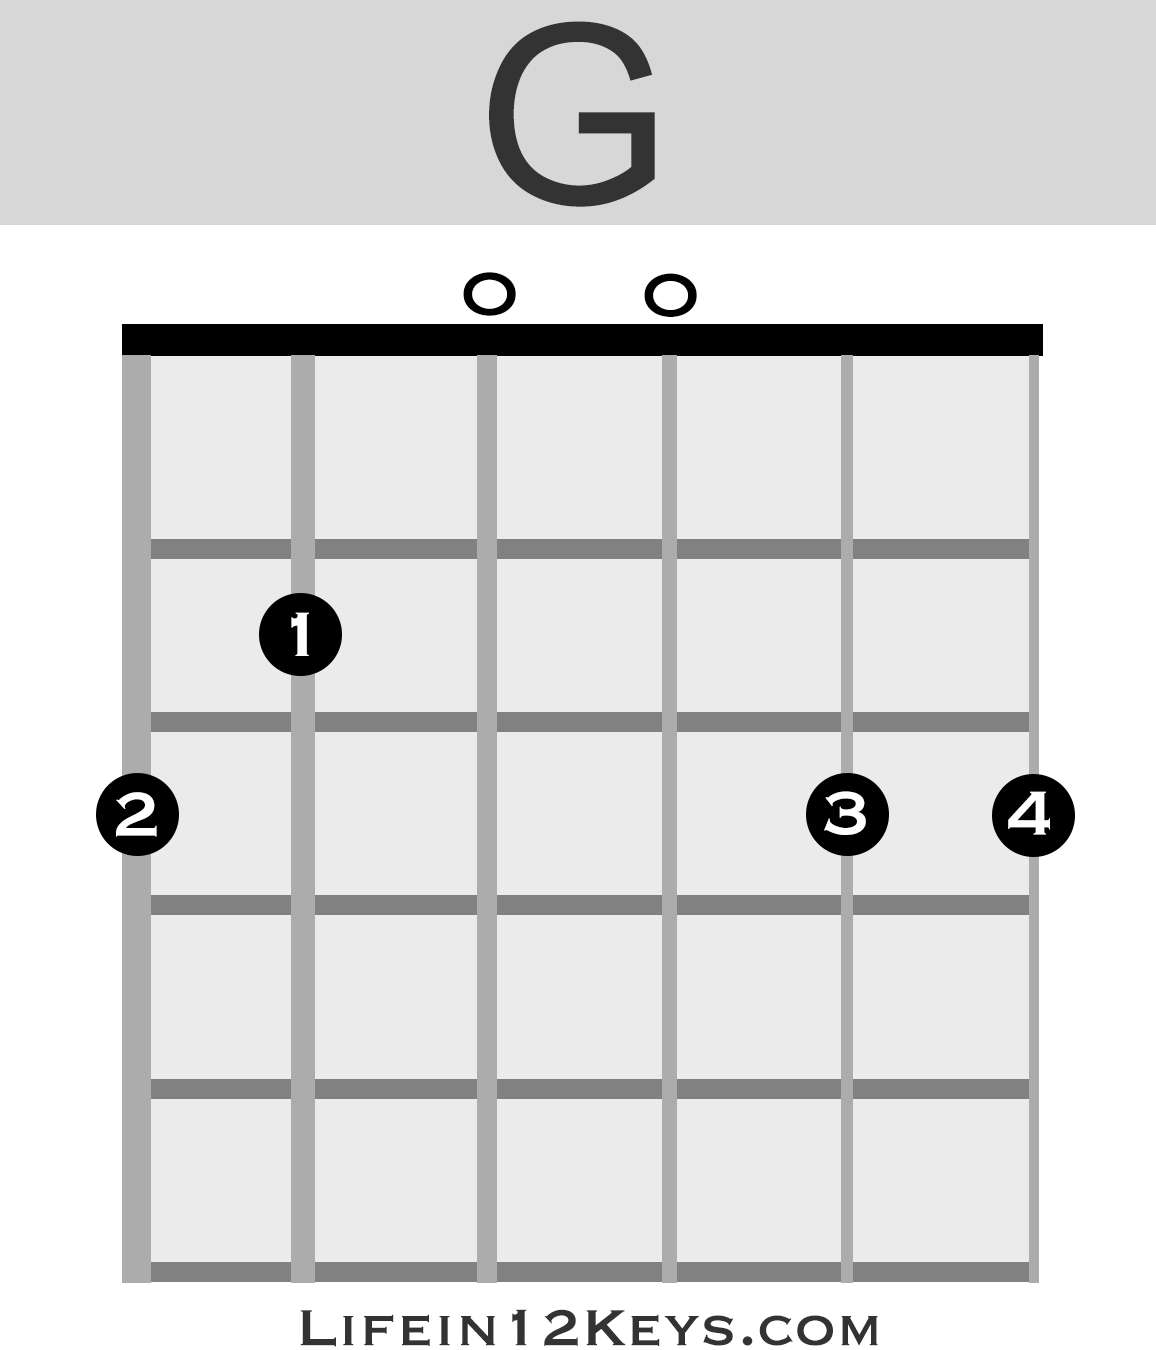 Guitar Chords For Beginners 20 Essential Guitar Chords For Beginners Life In 12 Keys